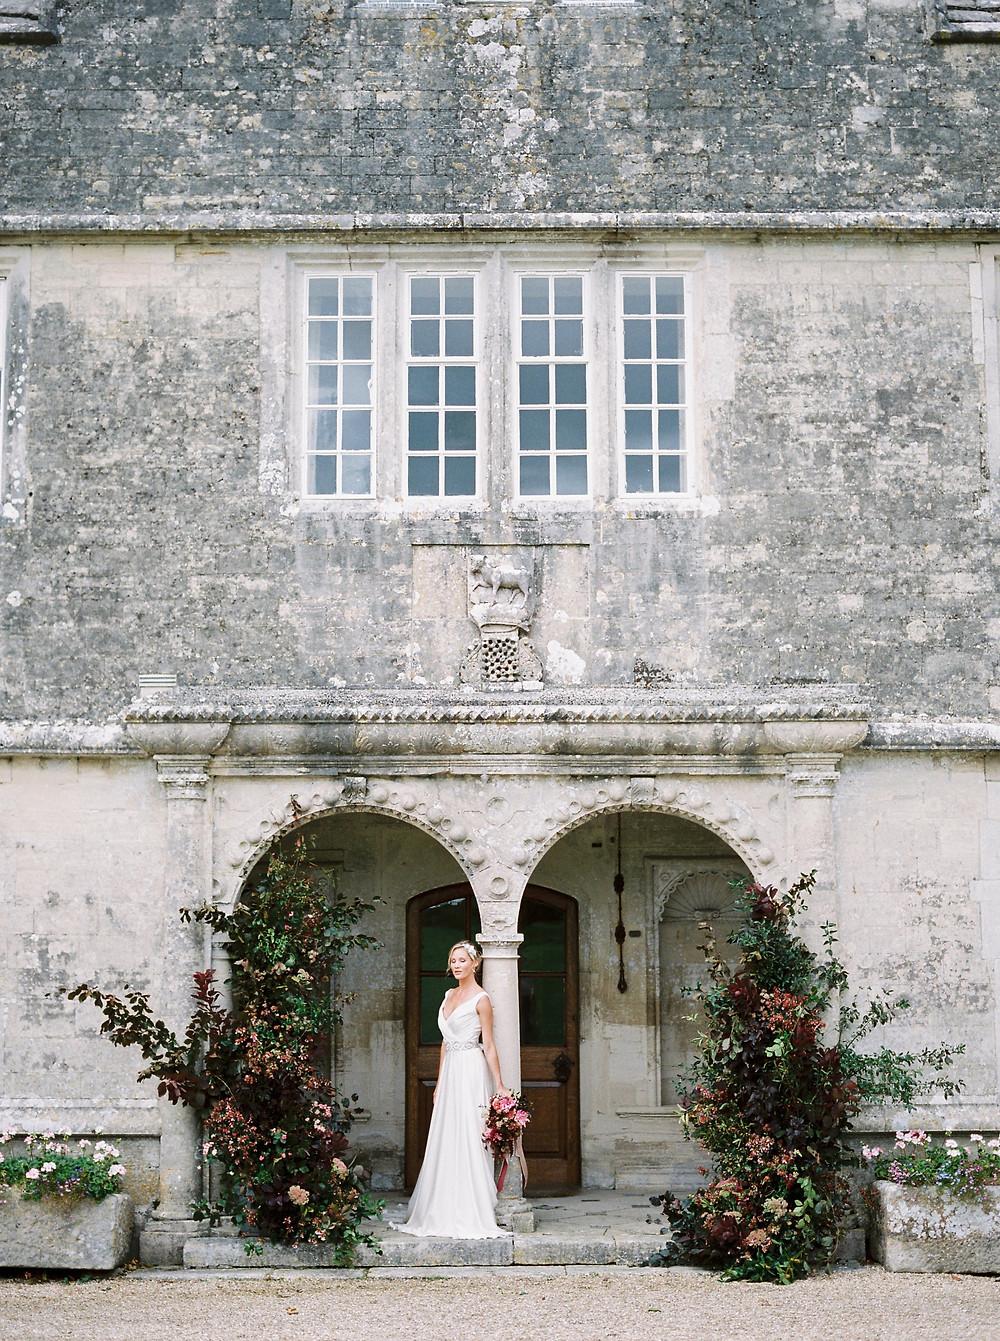 Warmwell House - Wedding Venue Dorset